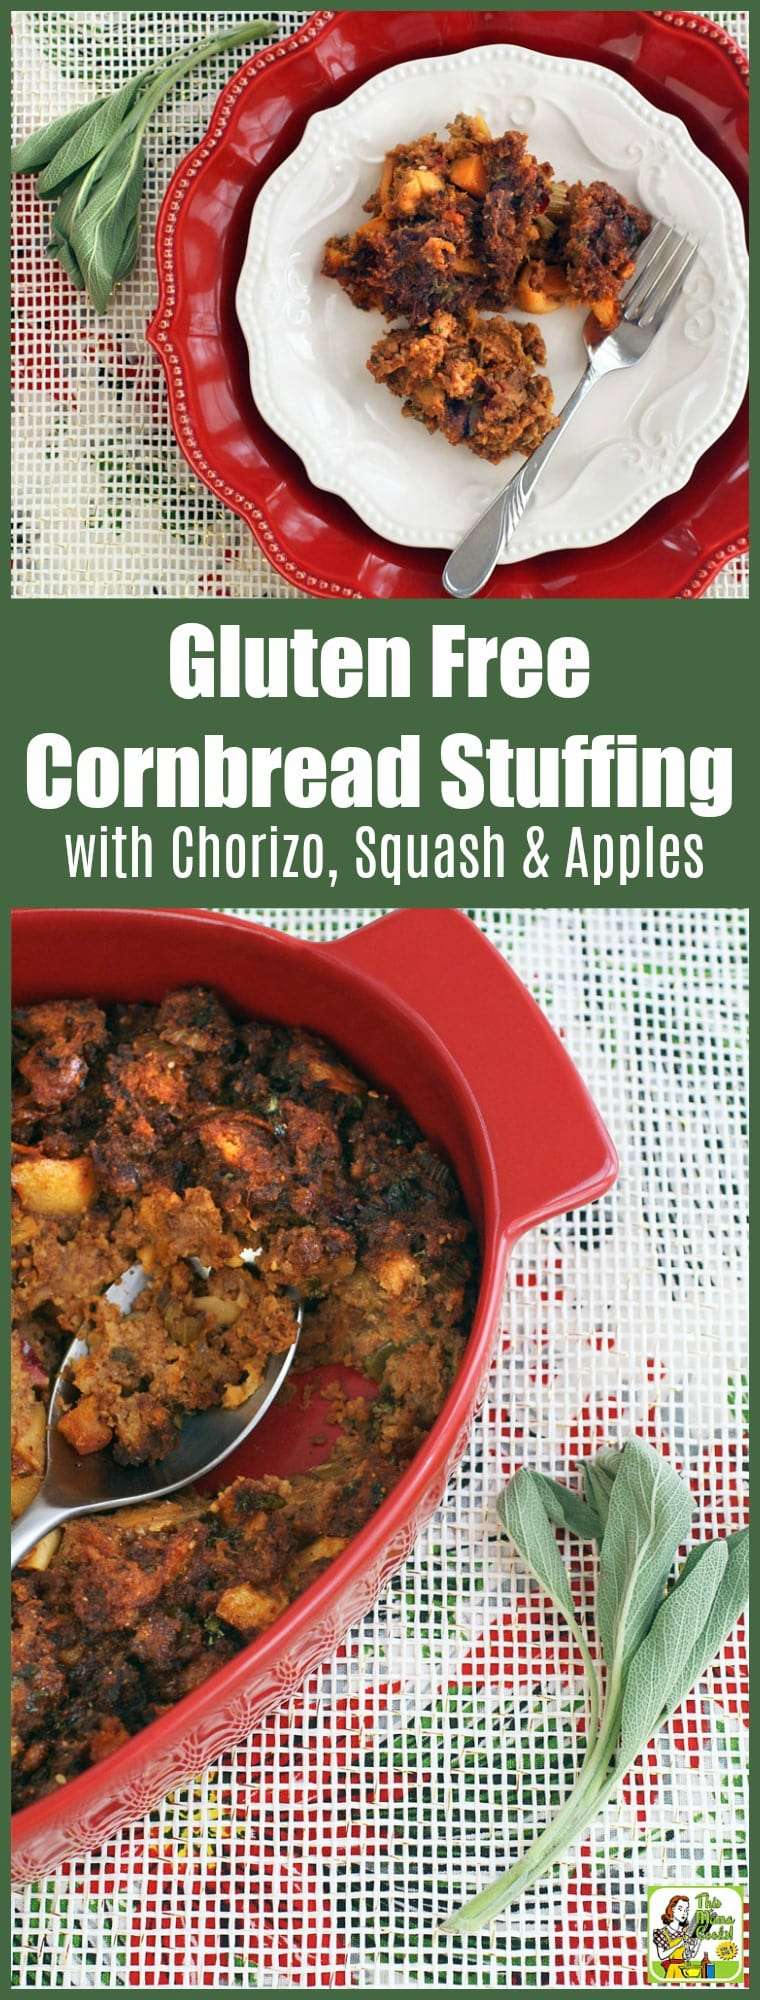 Gluten Free Cornbread Stuffing Recipe with Chorizo, Squash & Apples